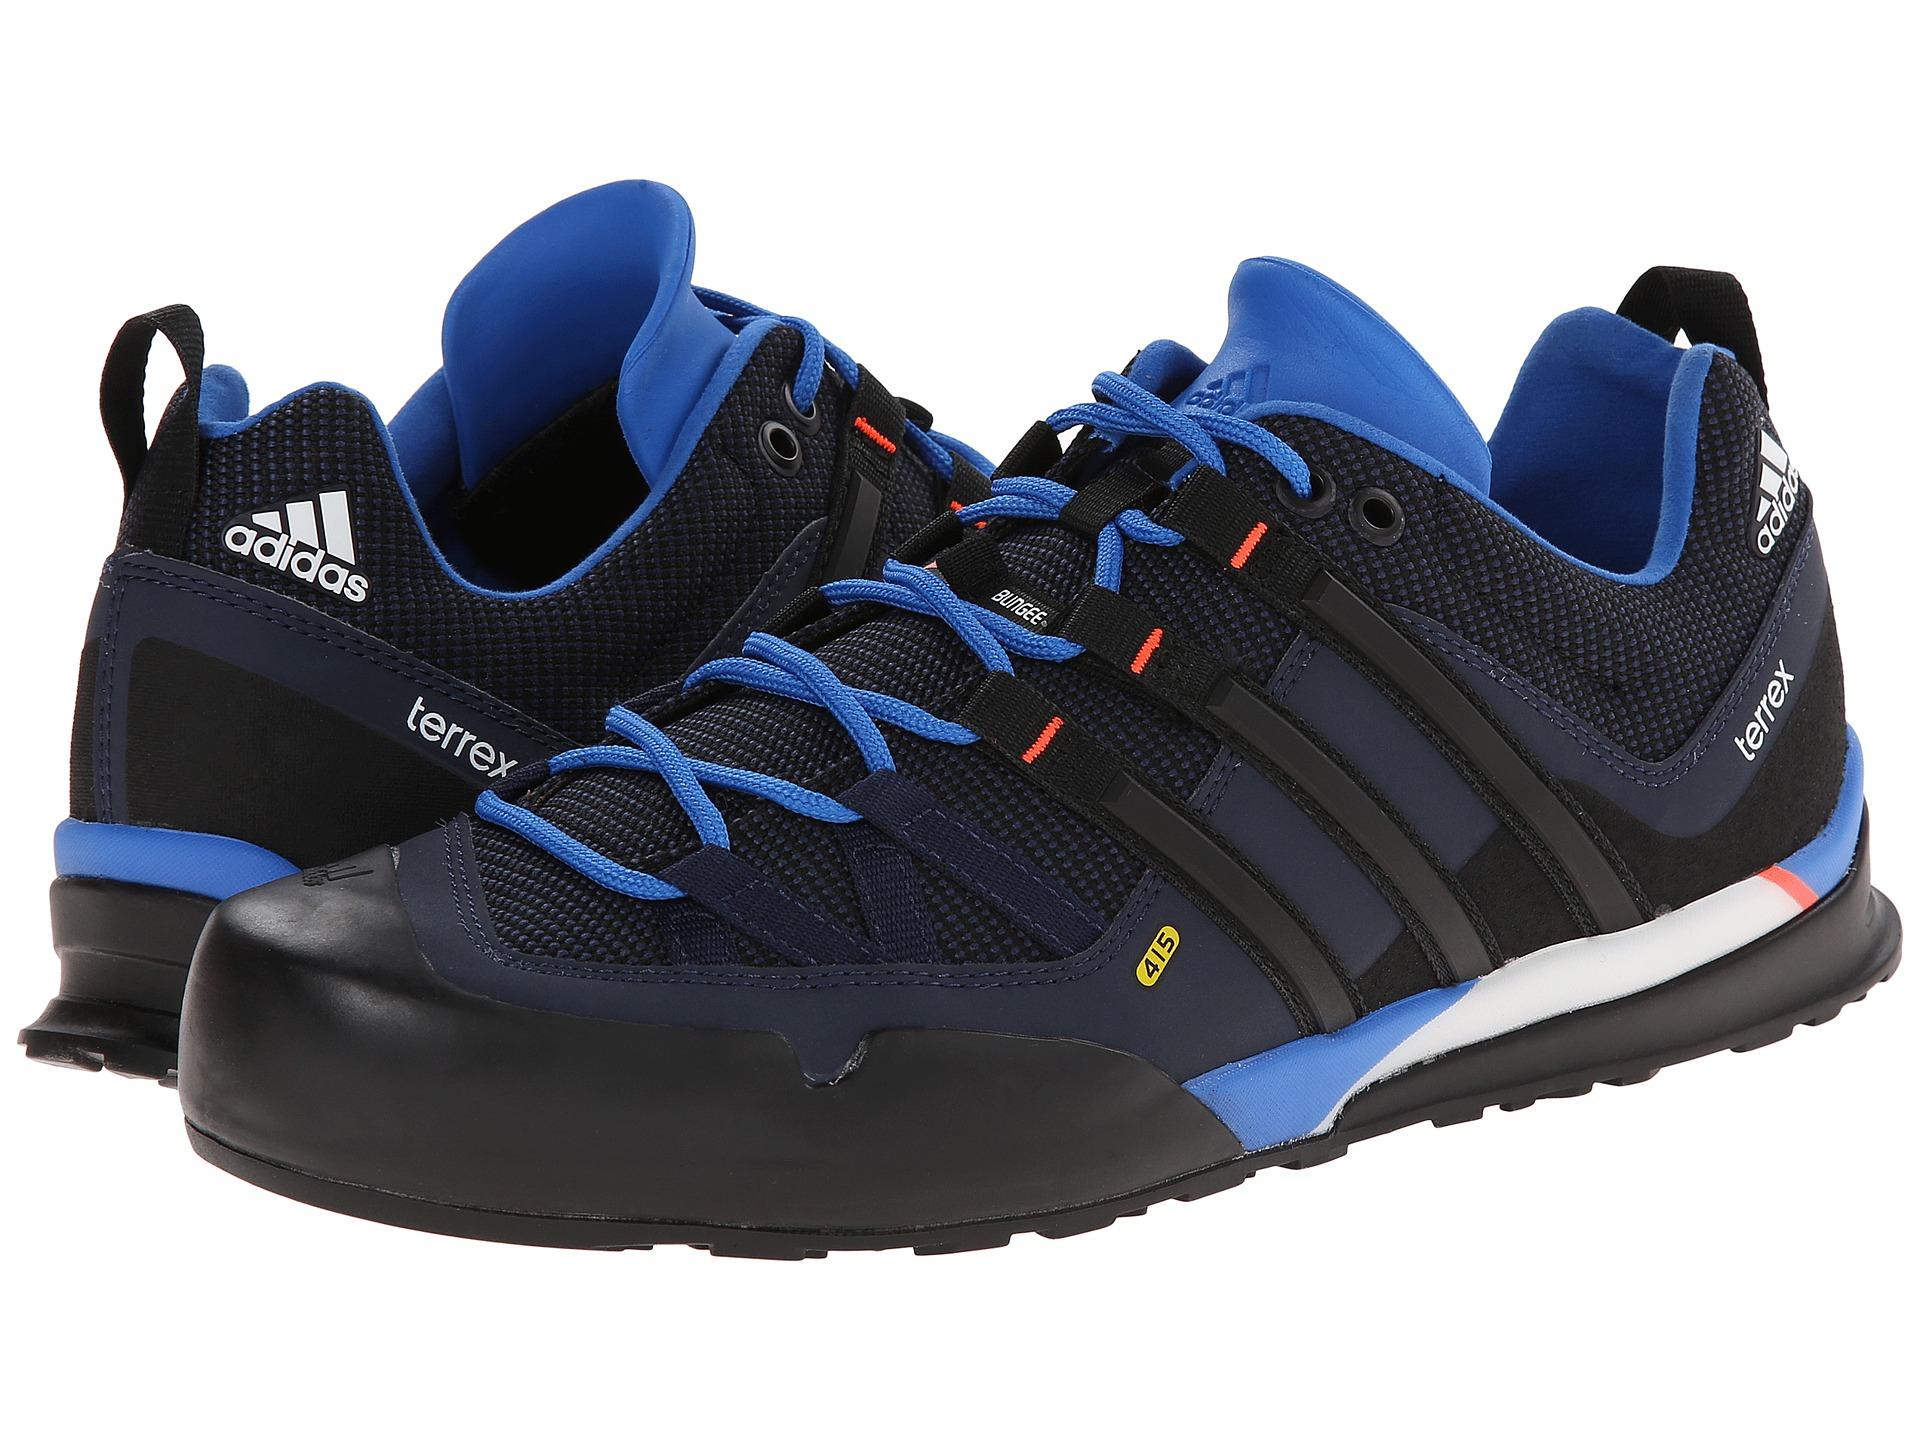 b1e54f0dc9b Lyst - adidas Terrex Solo in Blue for Men